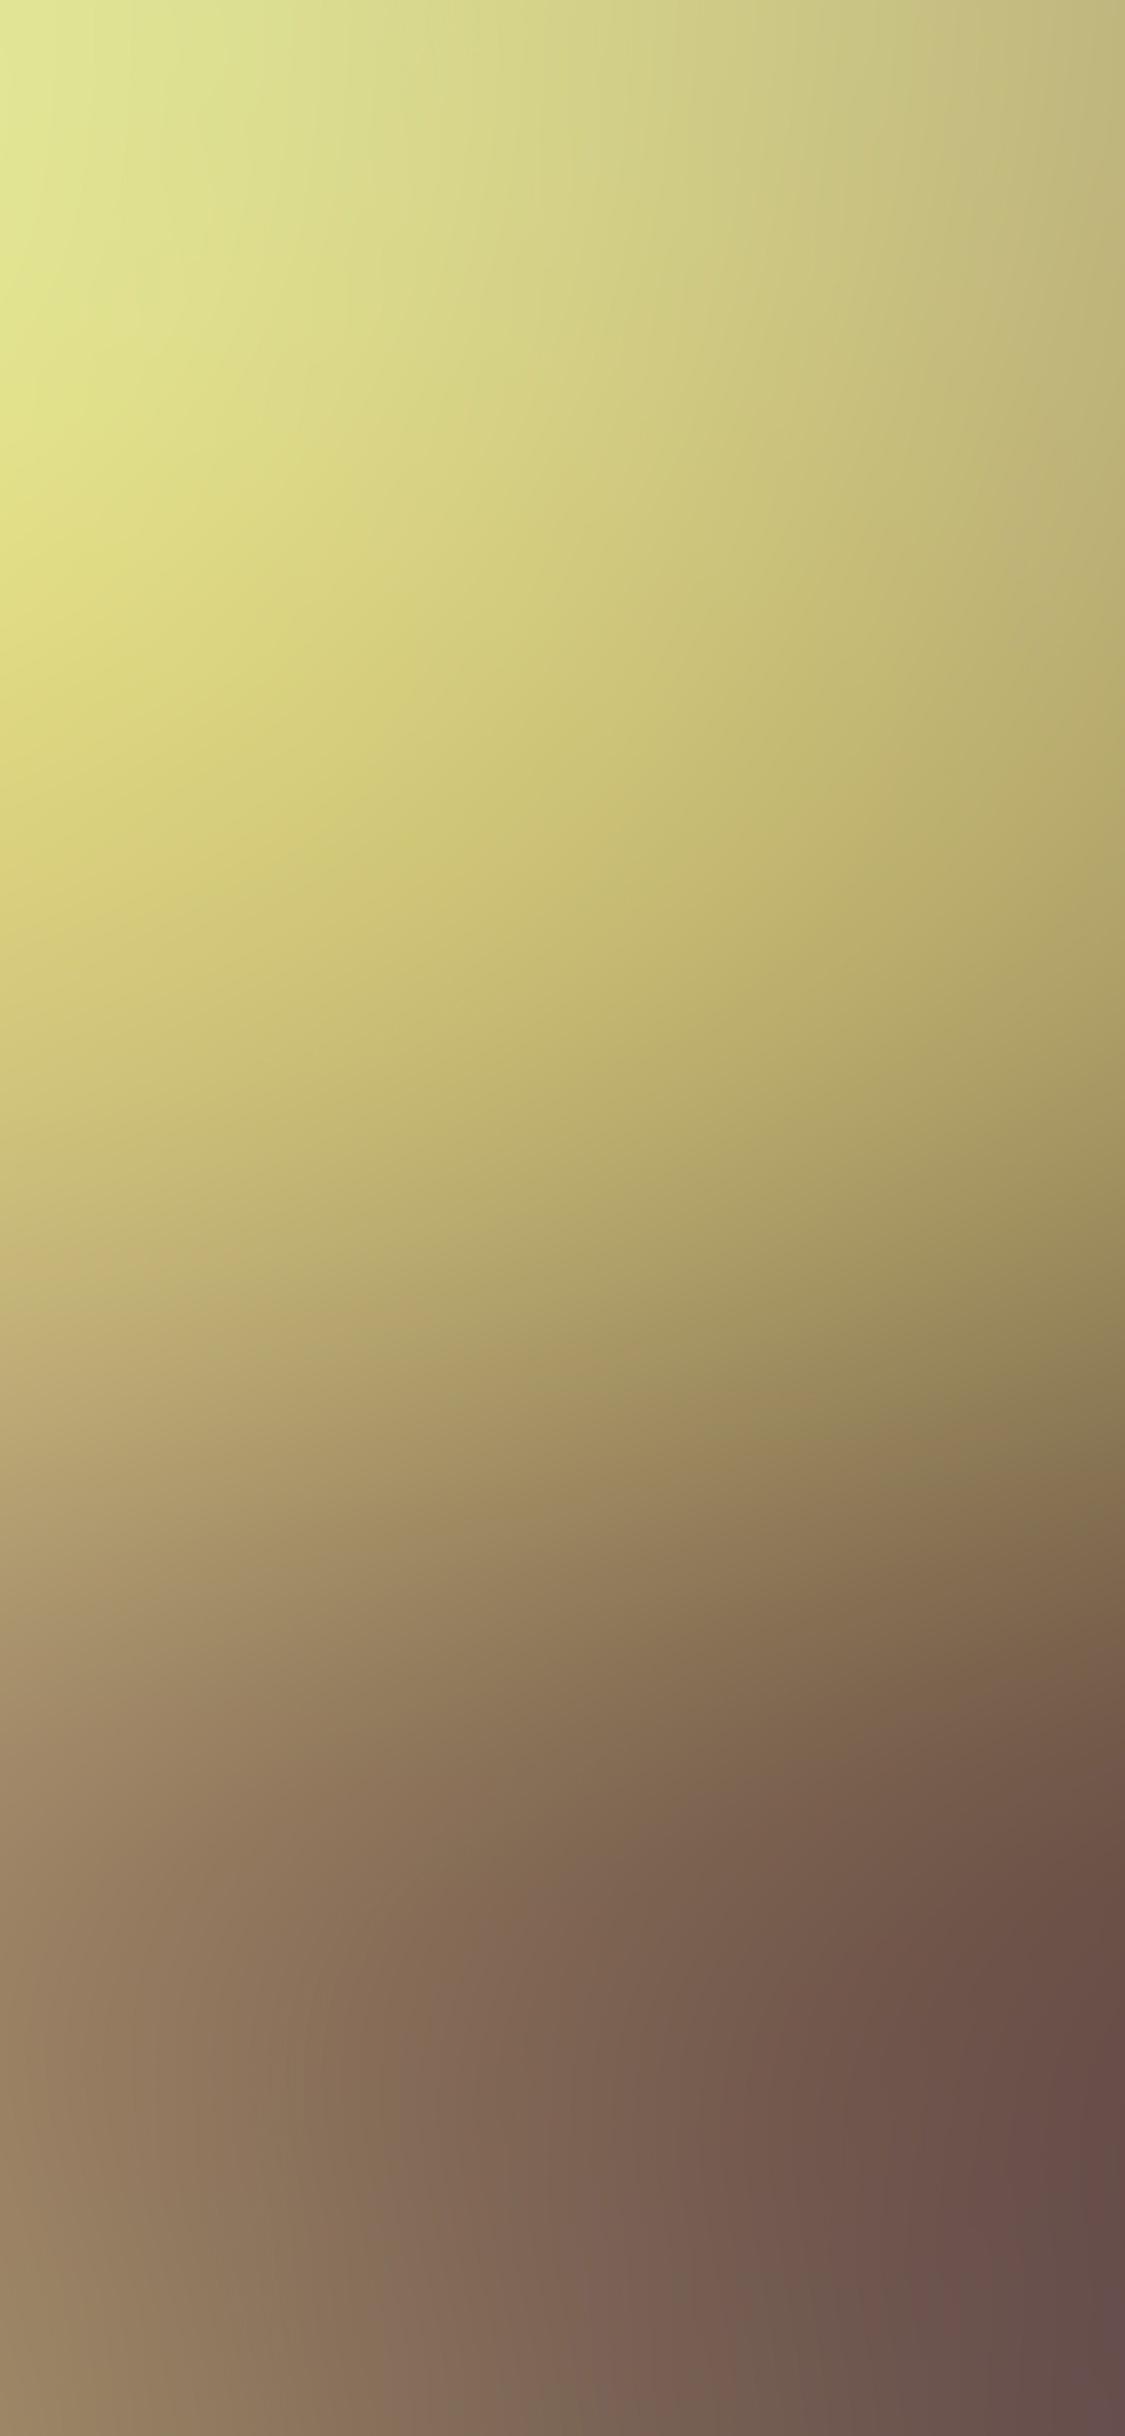 papers.co sj67 soft orange brown night gradation blur 41 iphone wallpaper